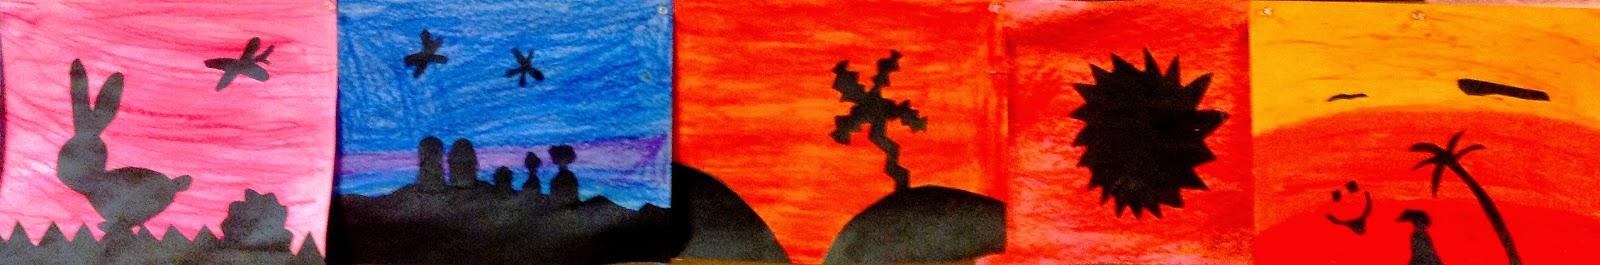 Fourth Grade Warm Cool Colors Silhouette Art Lesson